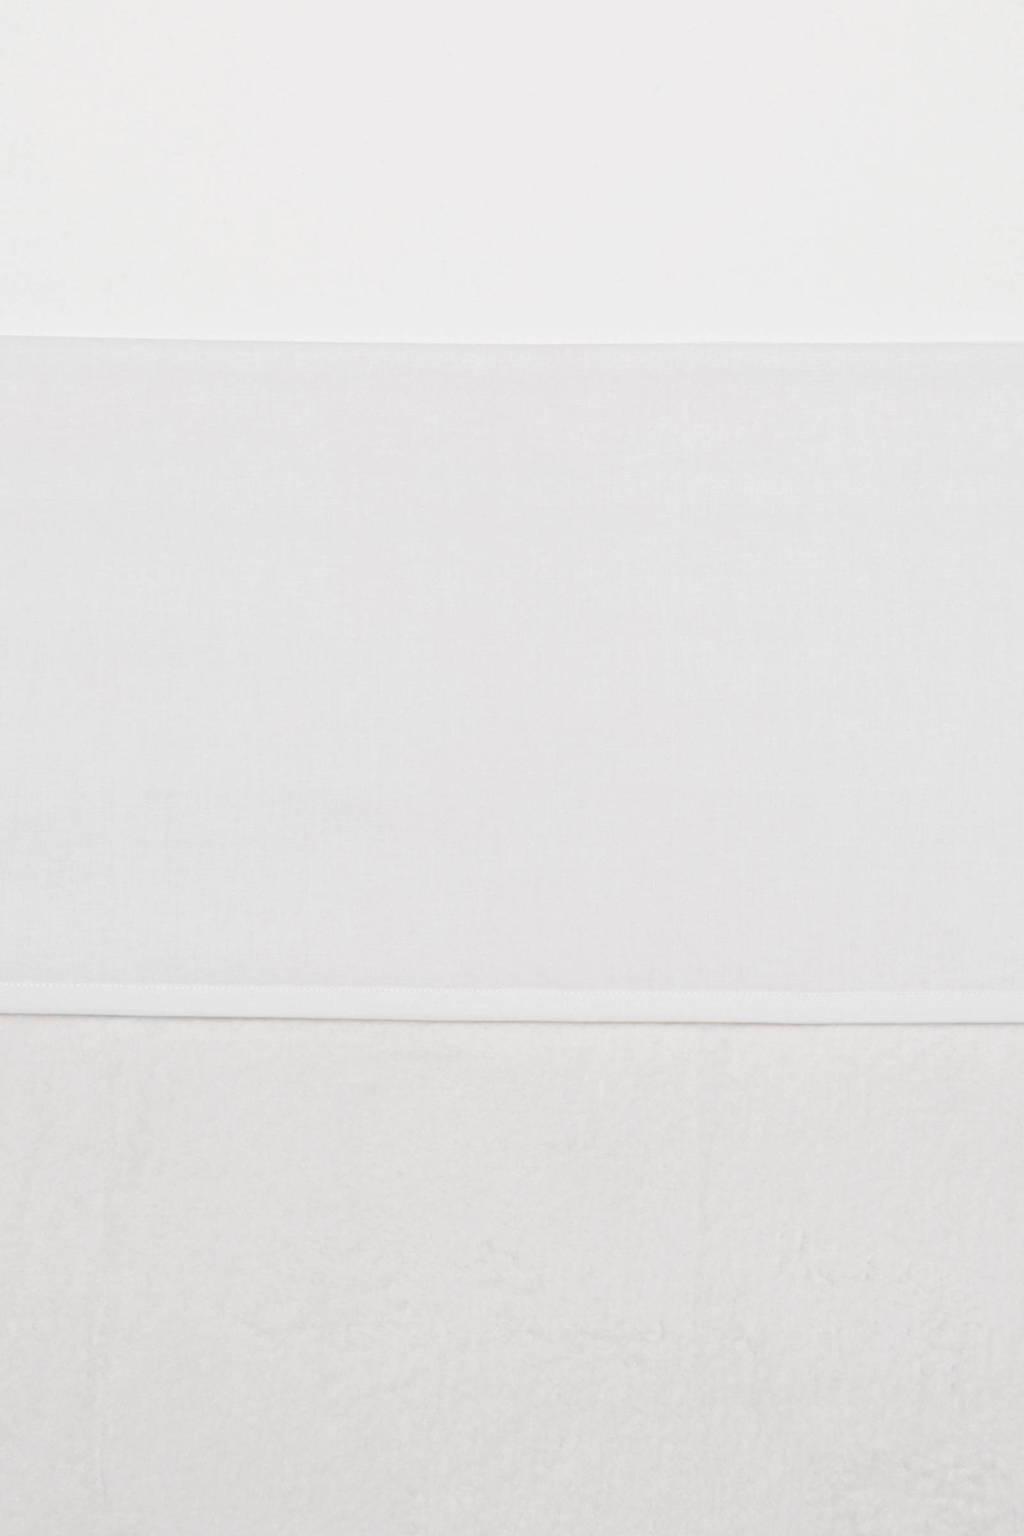 Meyco Uni ledikantlaken 100x150 cm wit, Wit